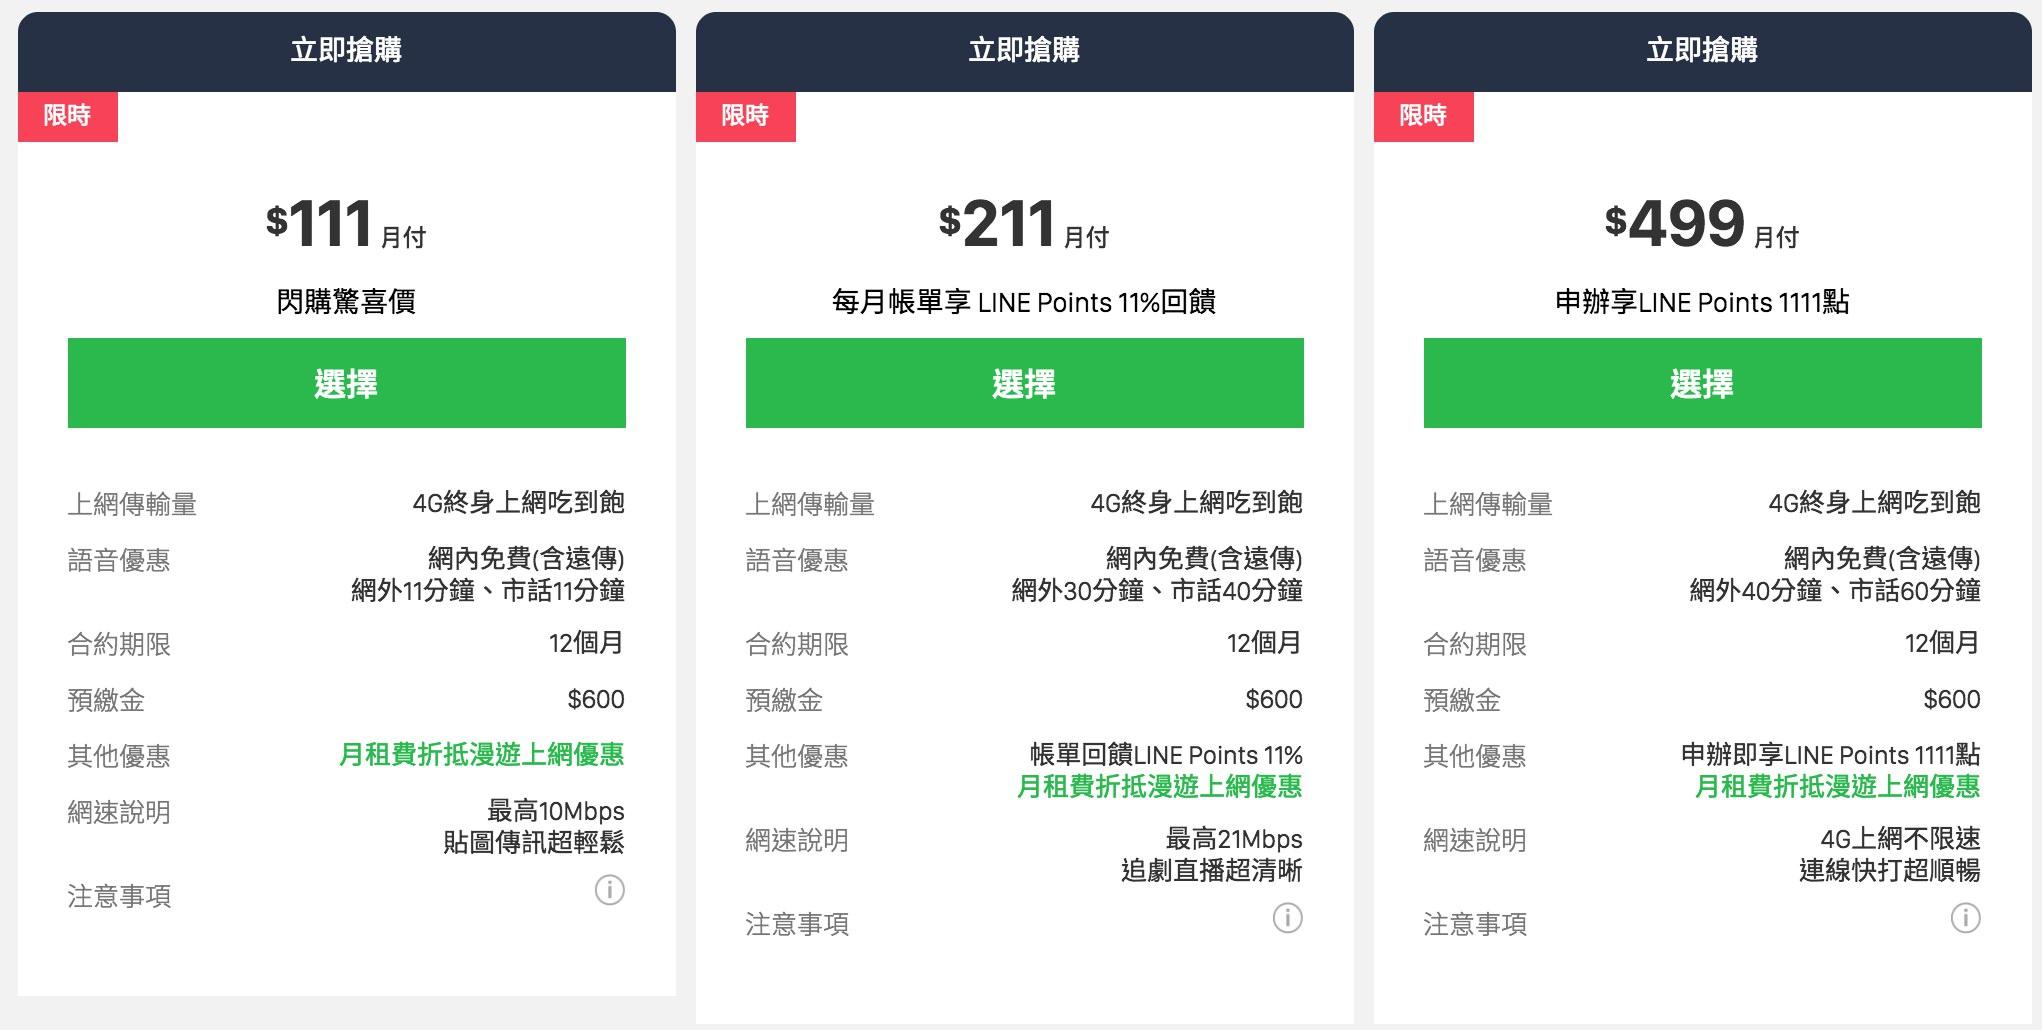 LINE MOBILE 雙11優惠方案 1111活動搶先跑